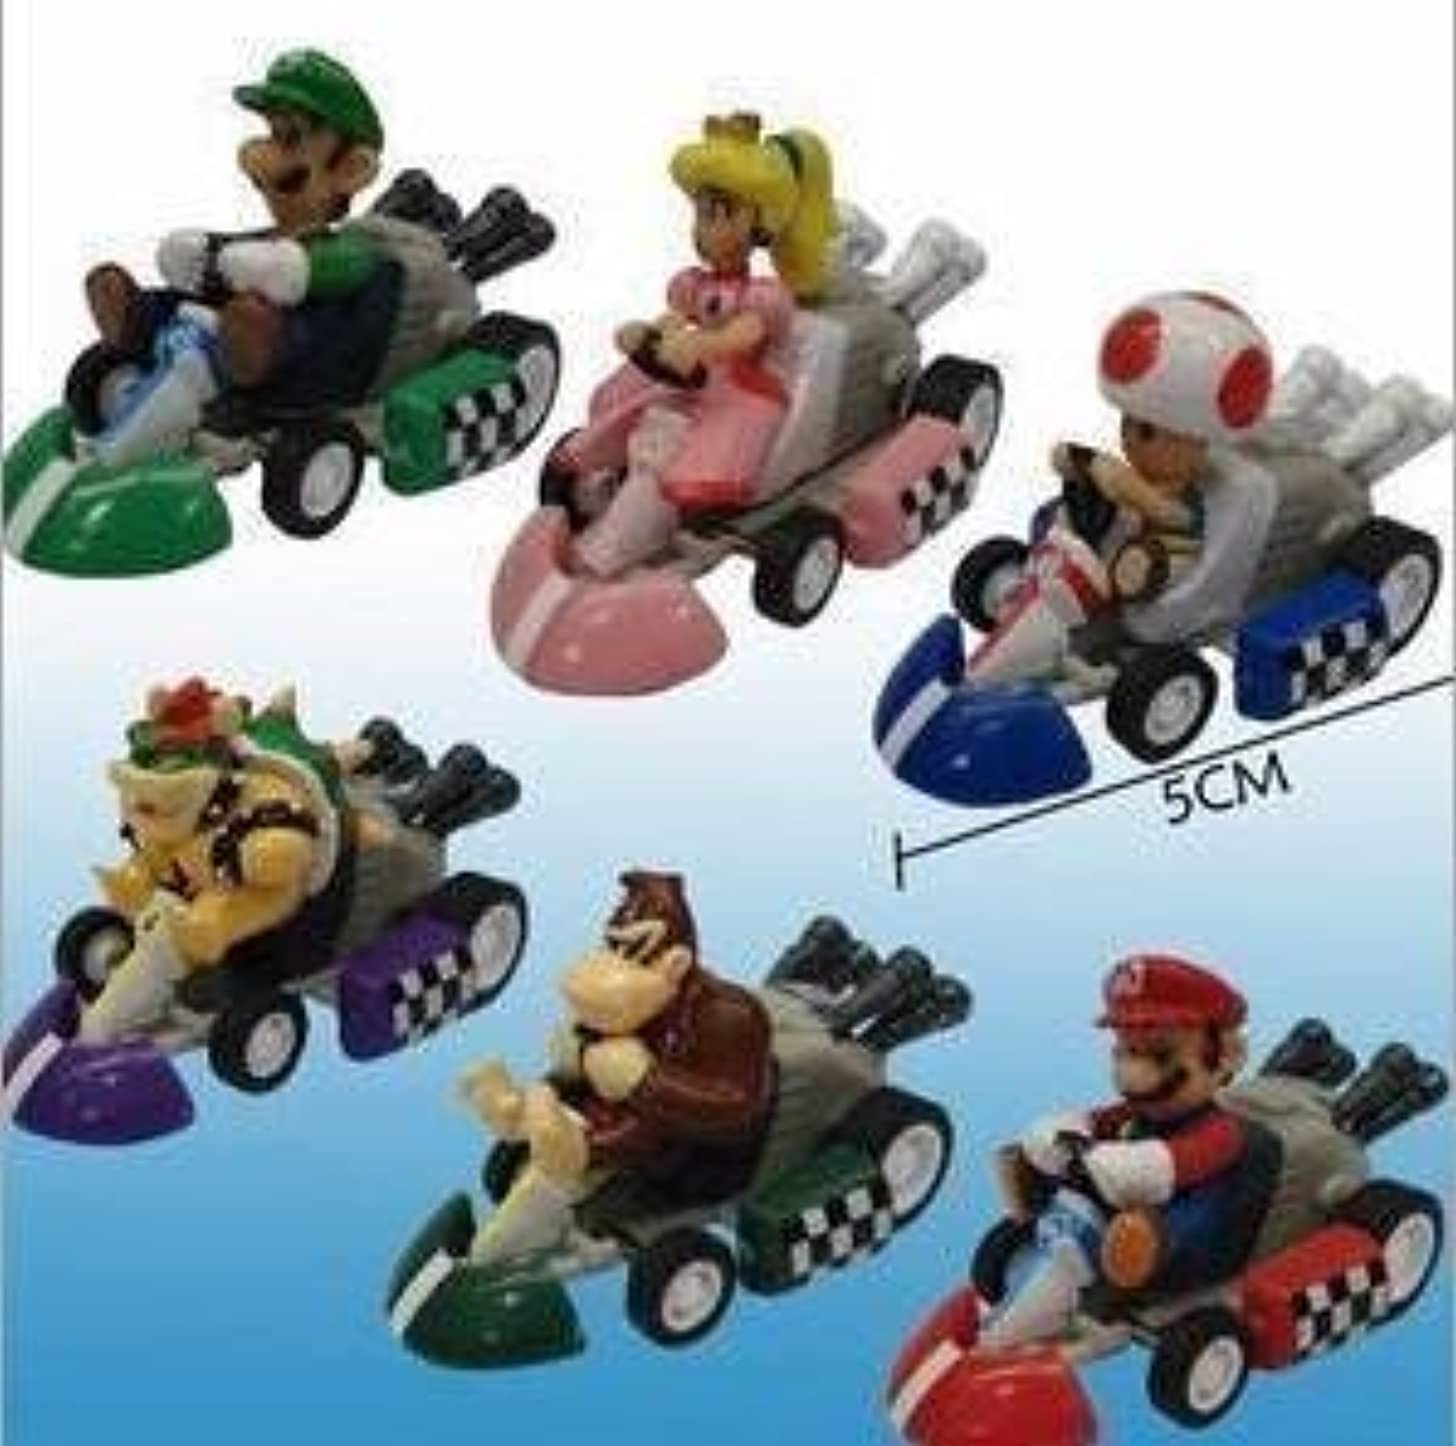 Super Mario Bros Car Toy - Set of 6 pcs Super Mario Bros. Kart PULL BACK Cars Figures super mario kart by Unknown